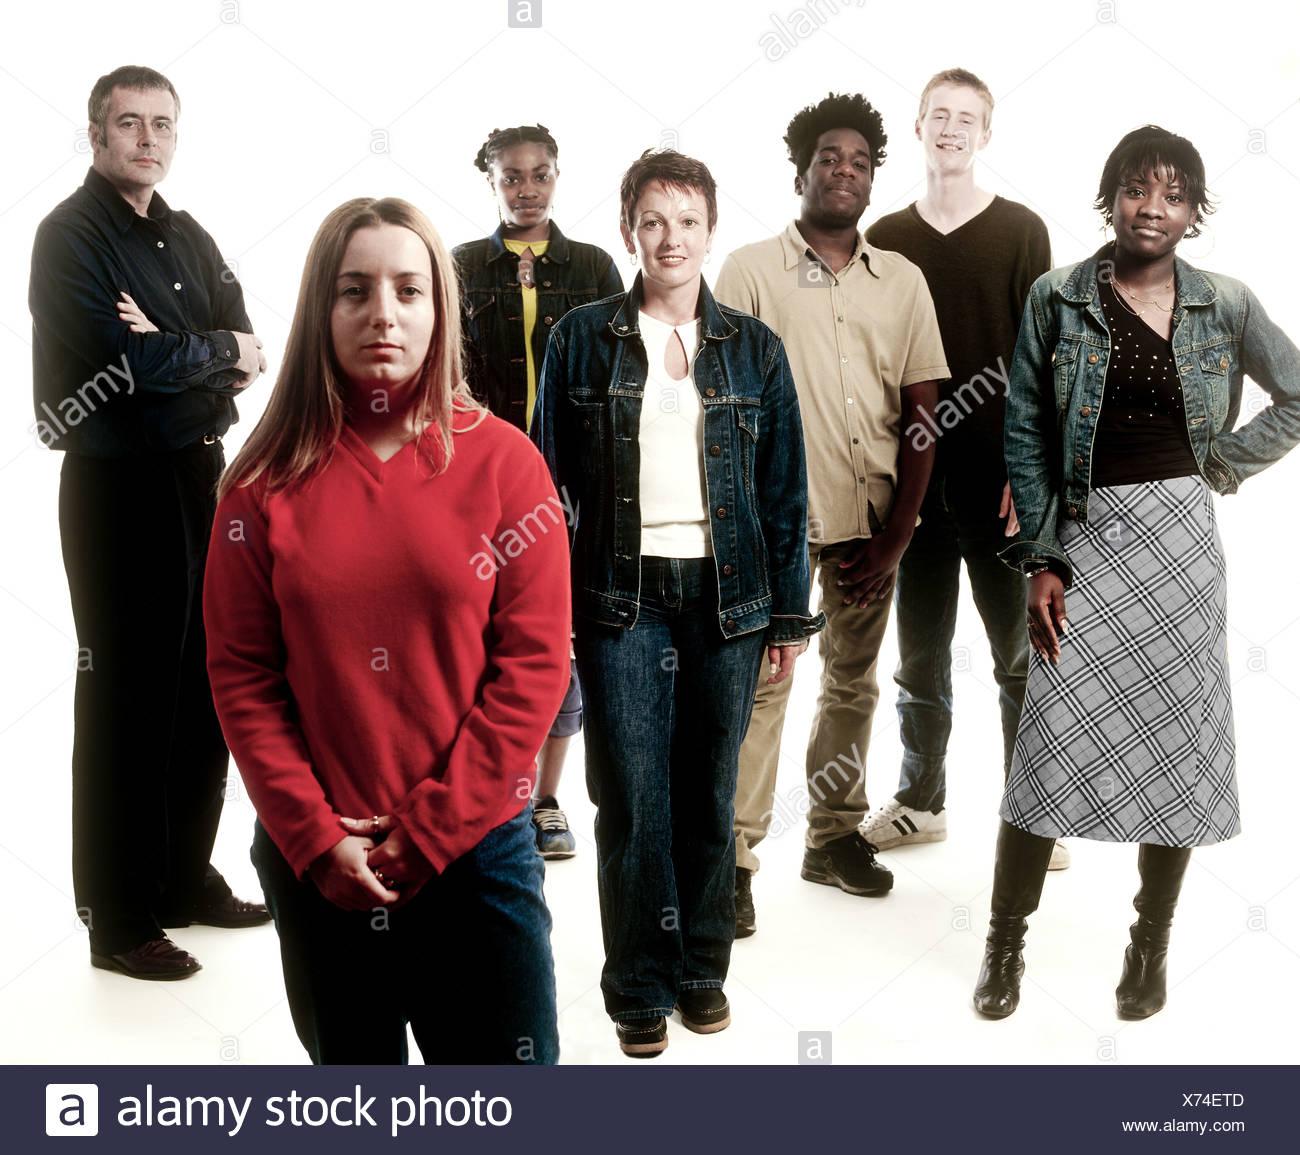 Group of seven people standing, studio shot - Stock Image